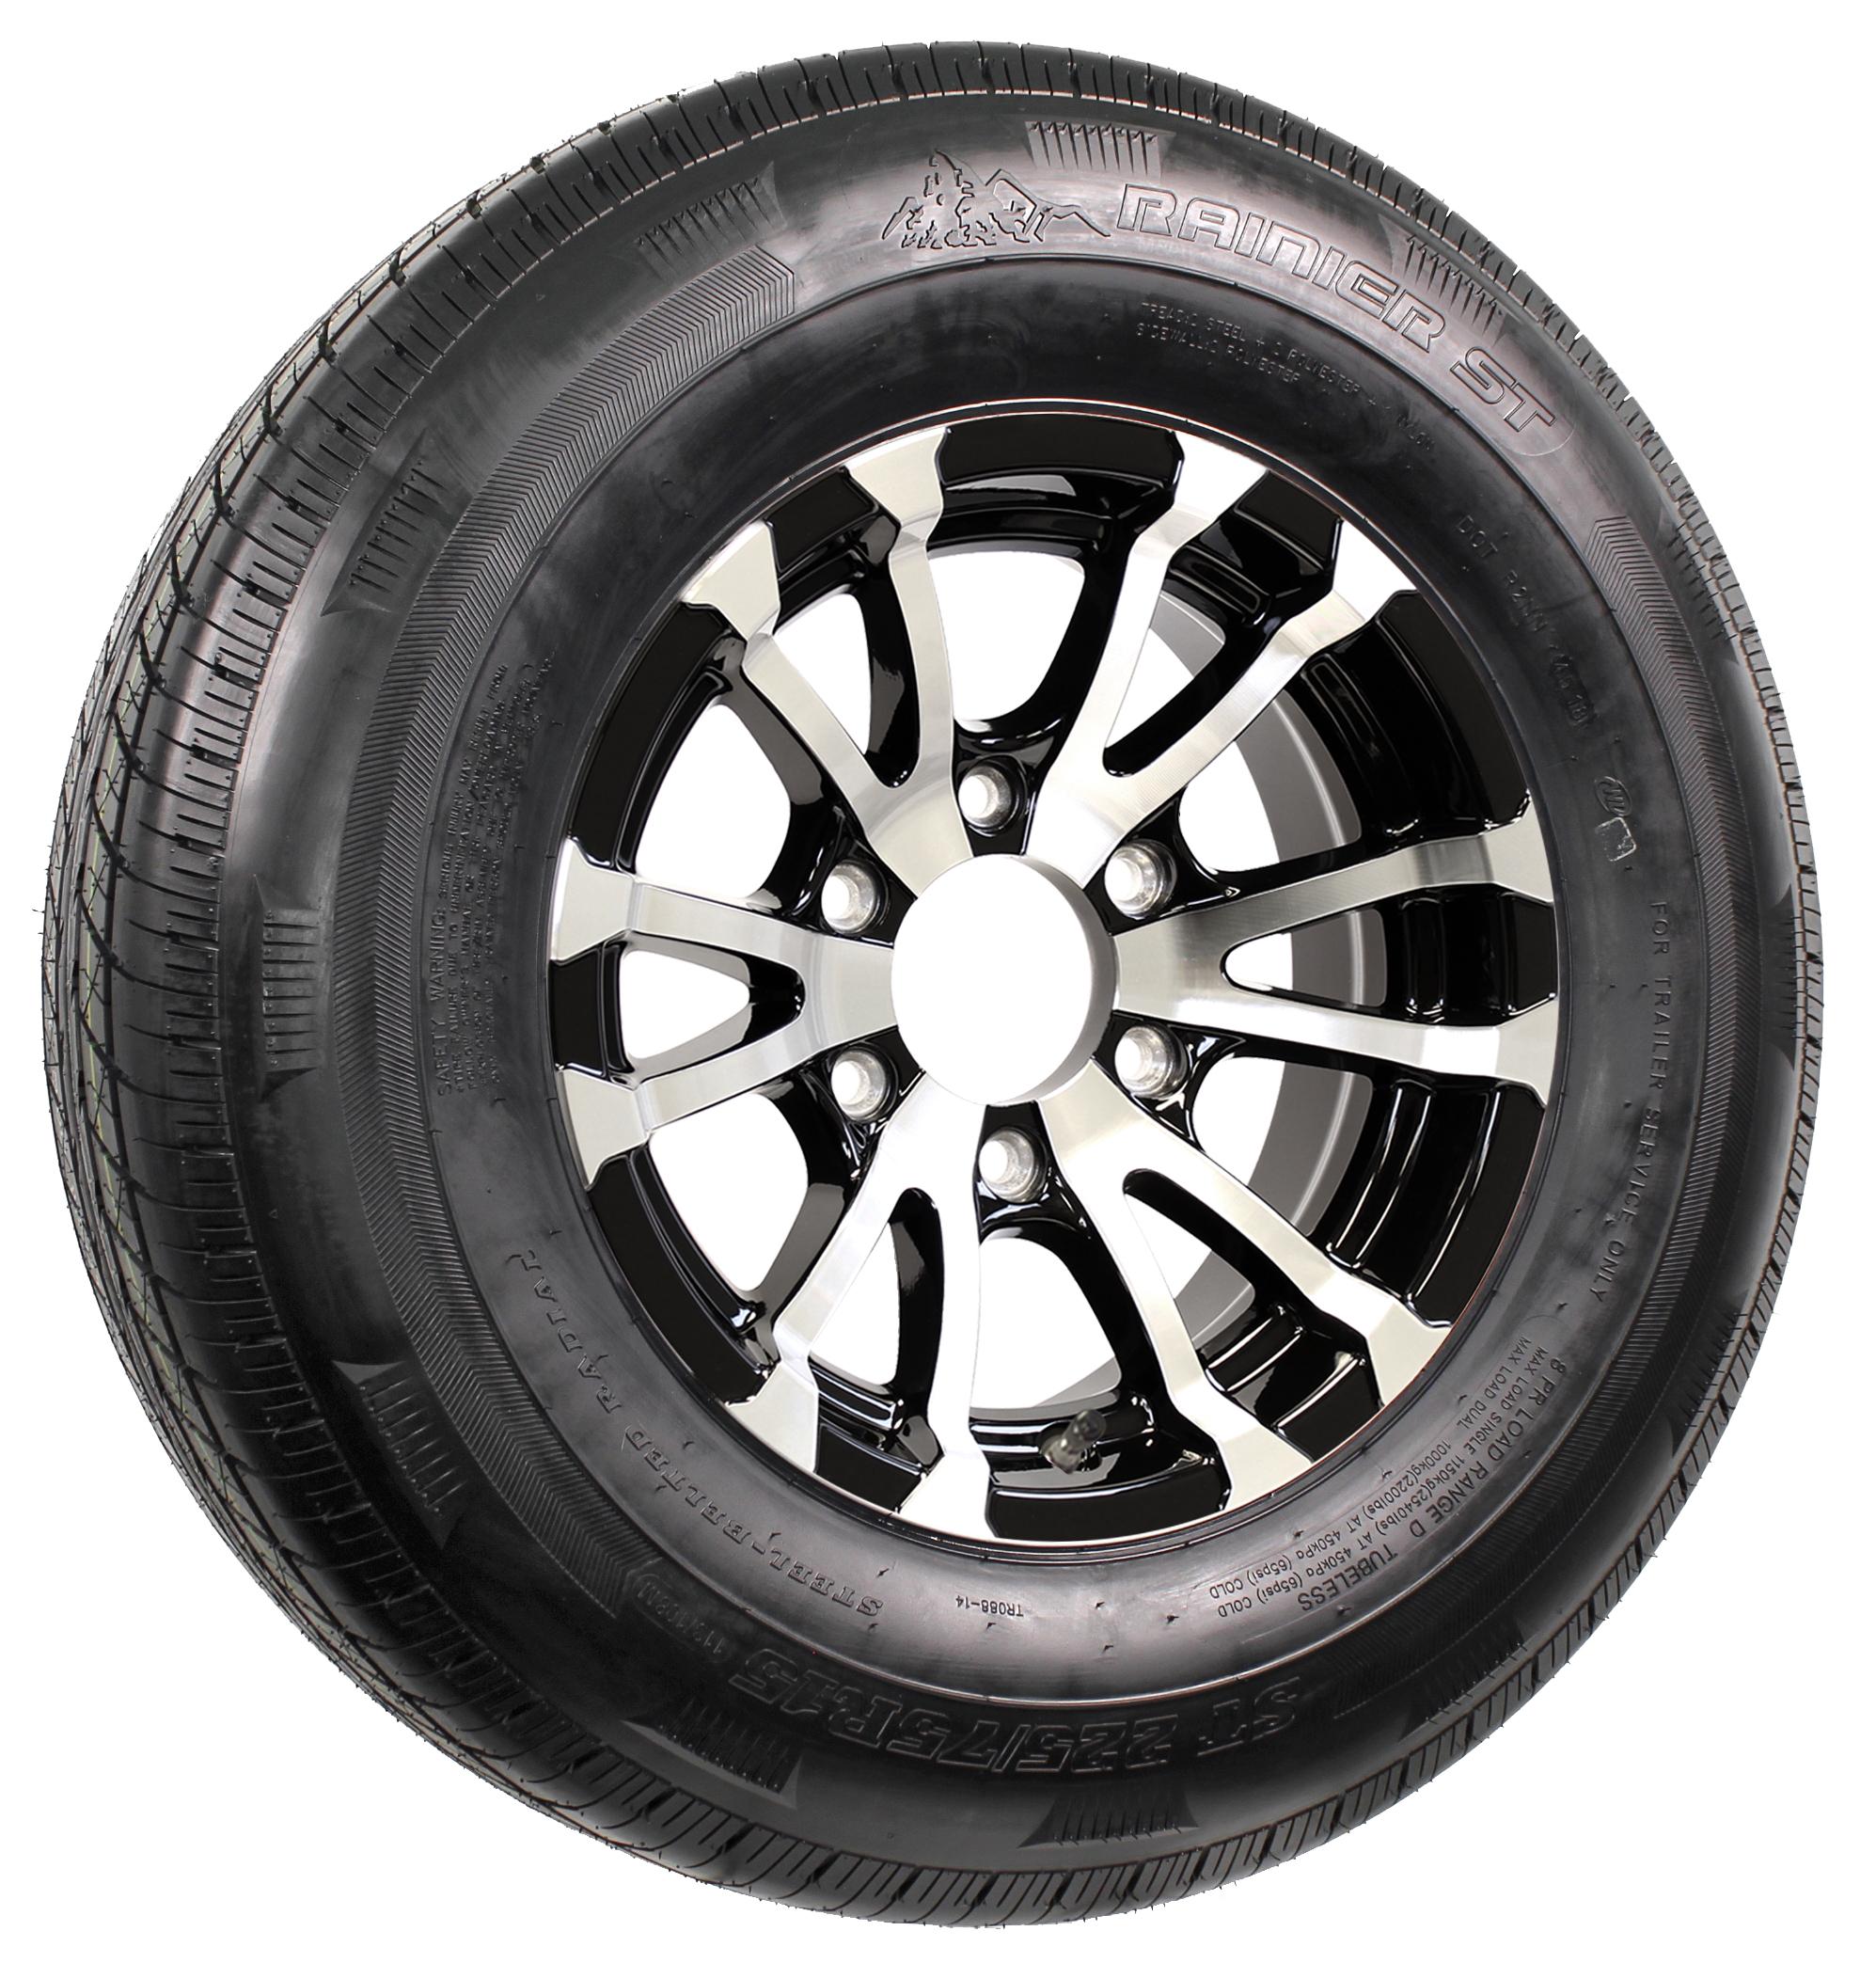 "Rainier ST225/75R15 LRE Radial Tire on 15"" 6-Lug Avalanche Black Aluminum Assembly Image"